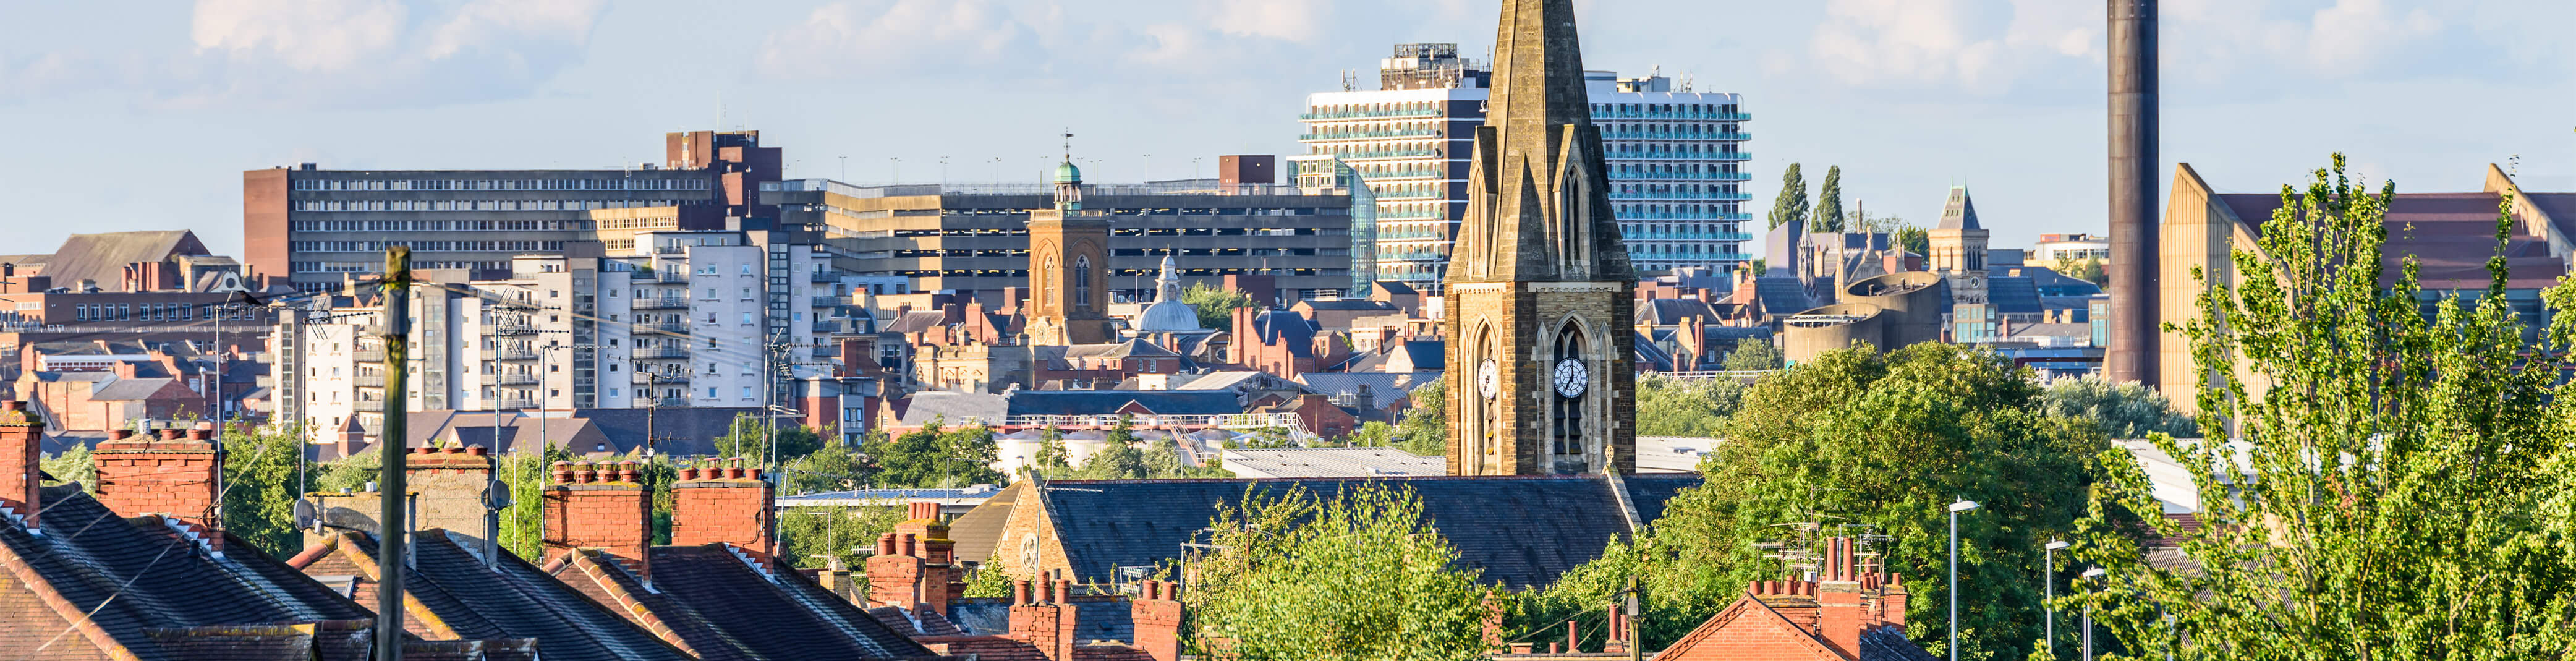 Online Training Courses In Northampton